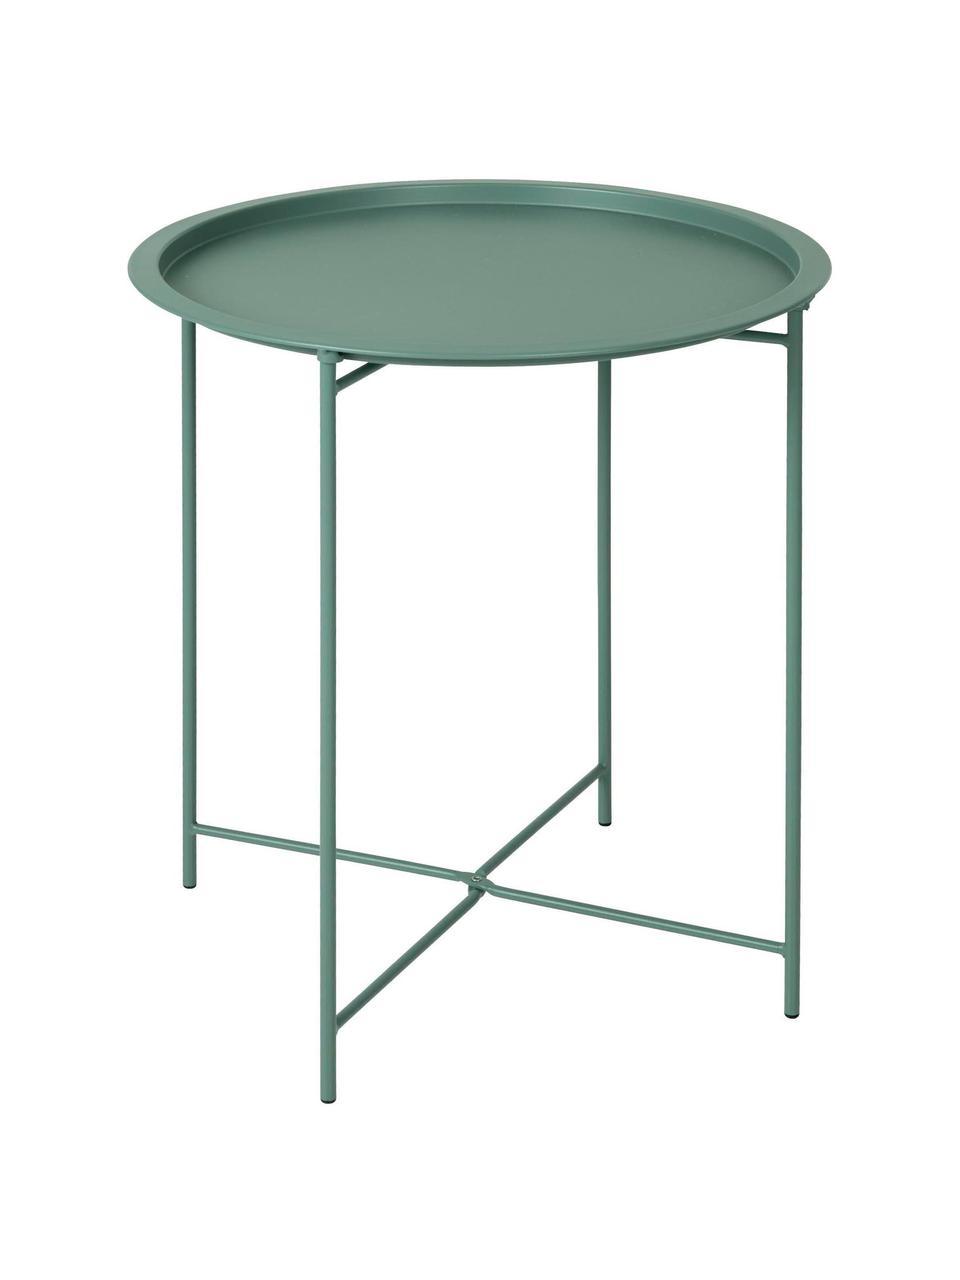 Table d'appoint en métal Sangro, Vert